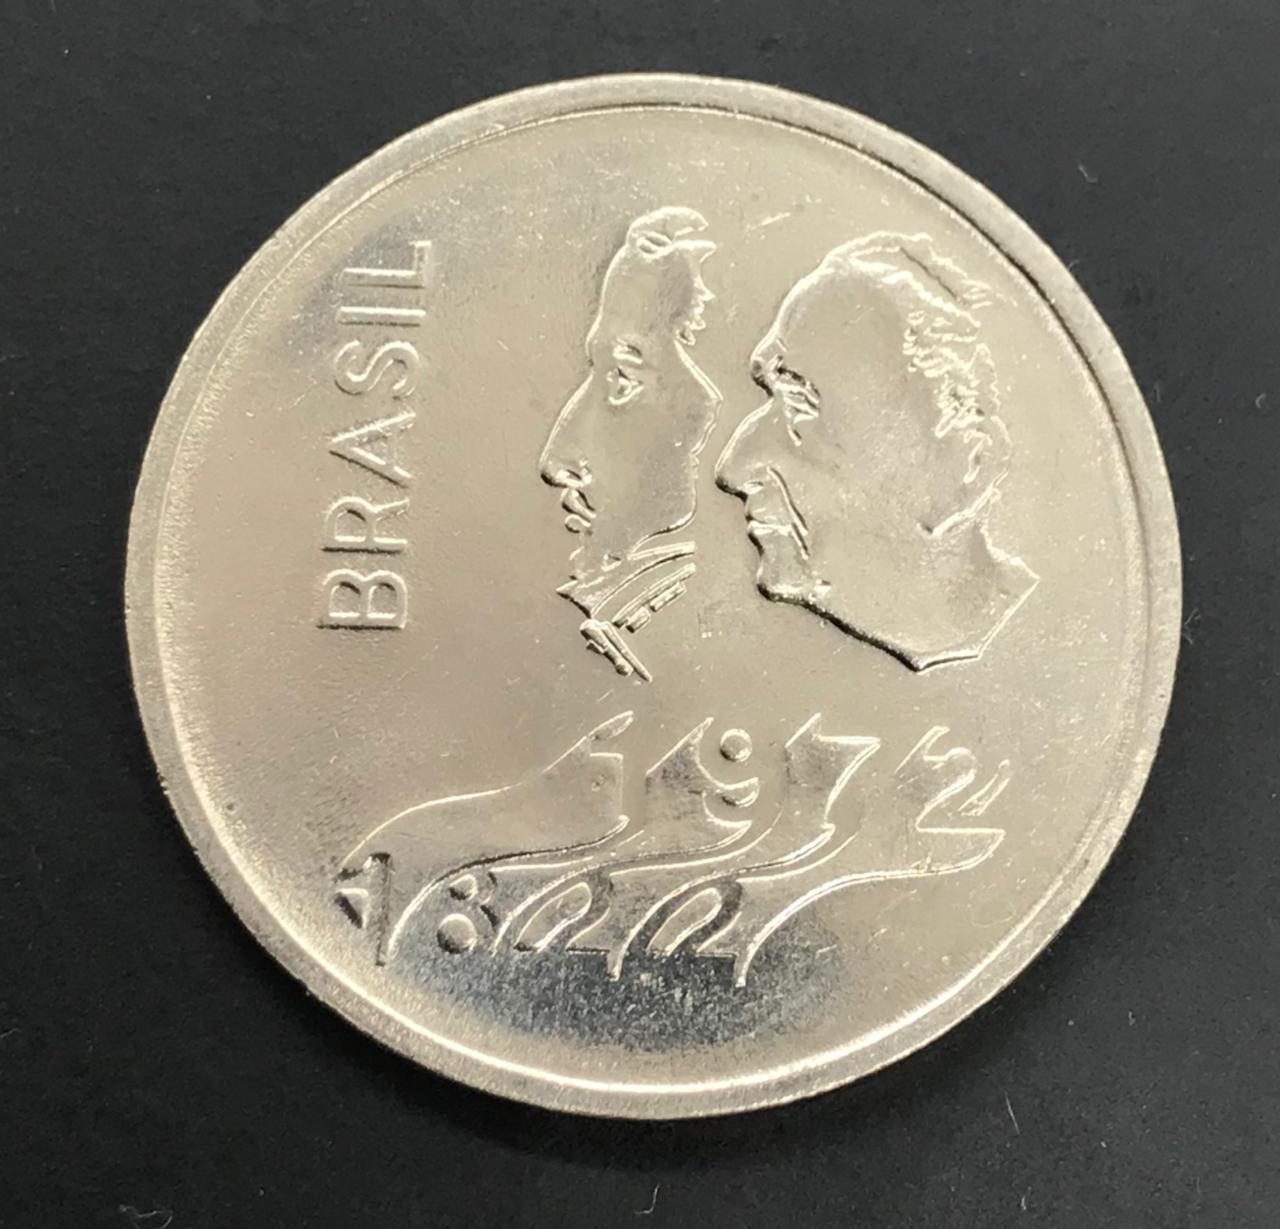 1 CRUZEIRO 1972